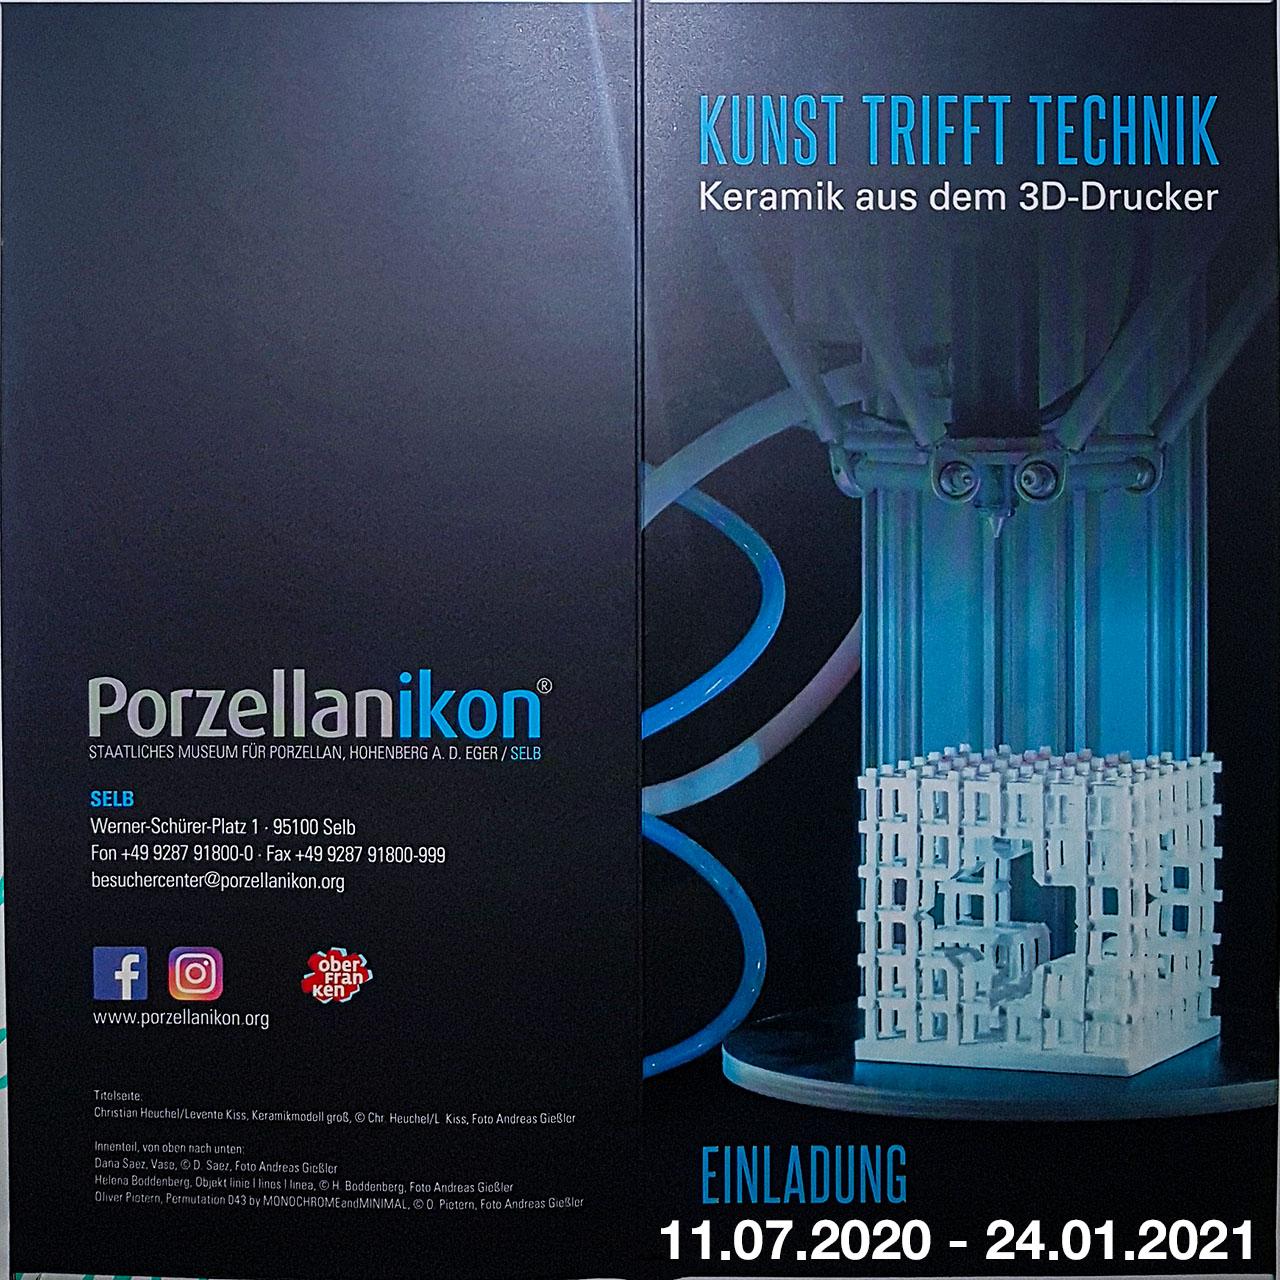 Kunst Trifft Technik exhibition with my sculptures